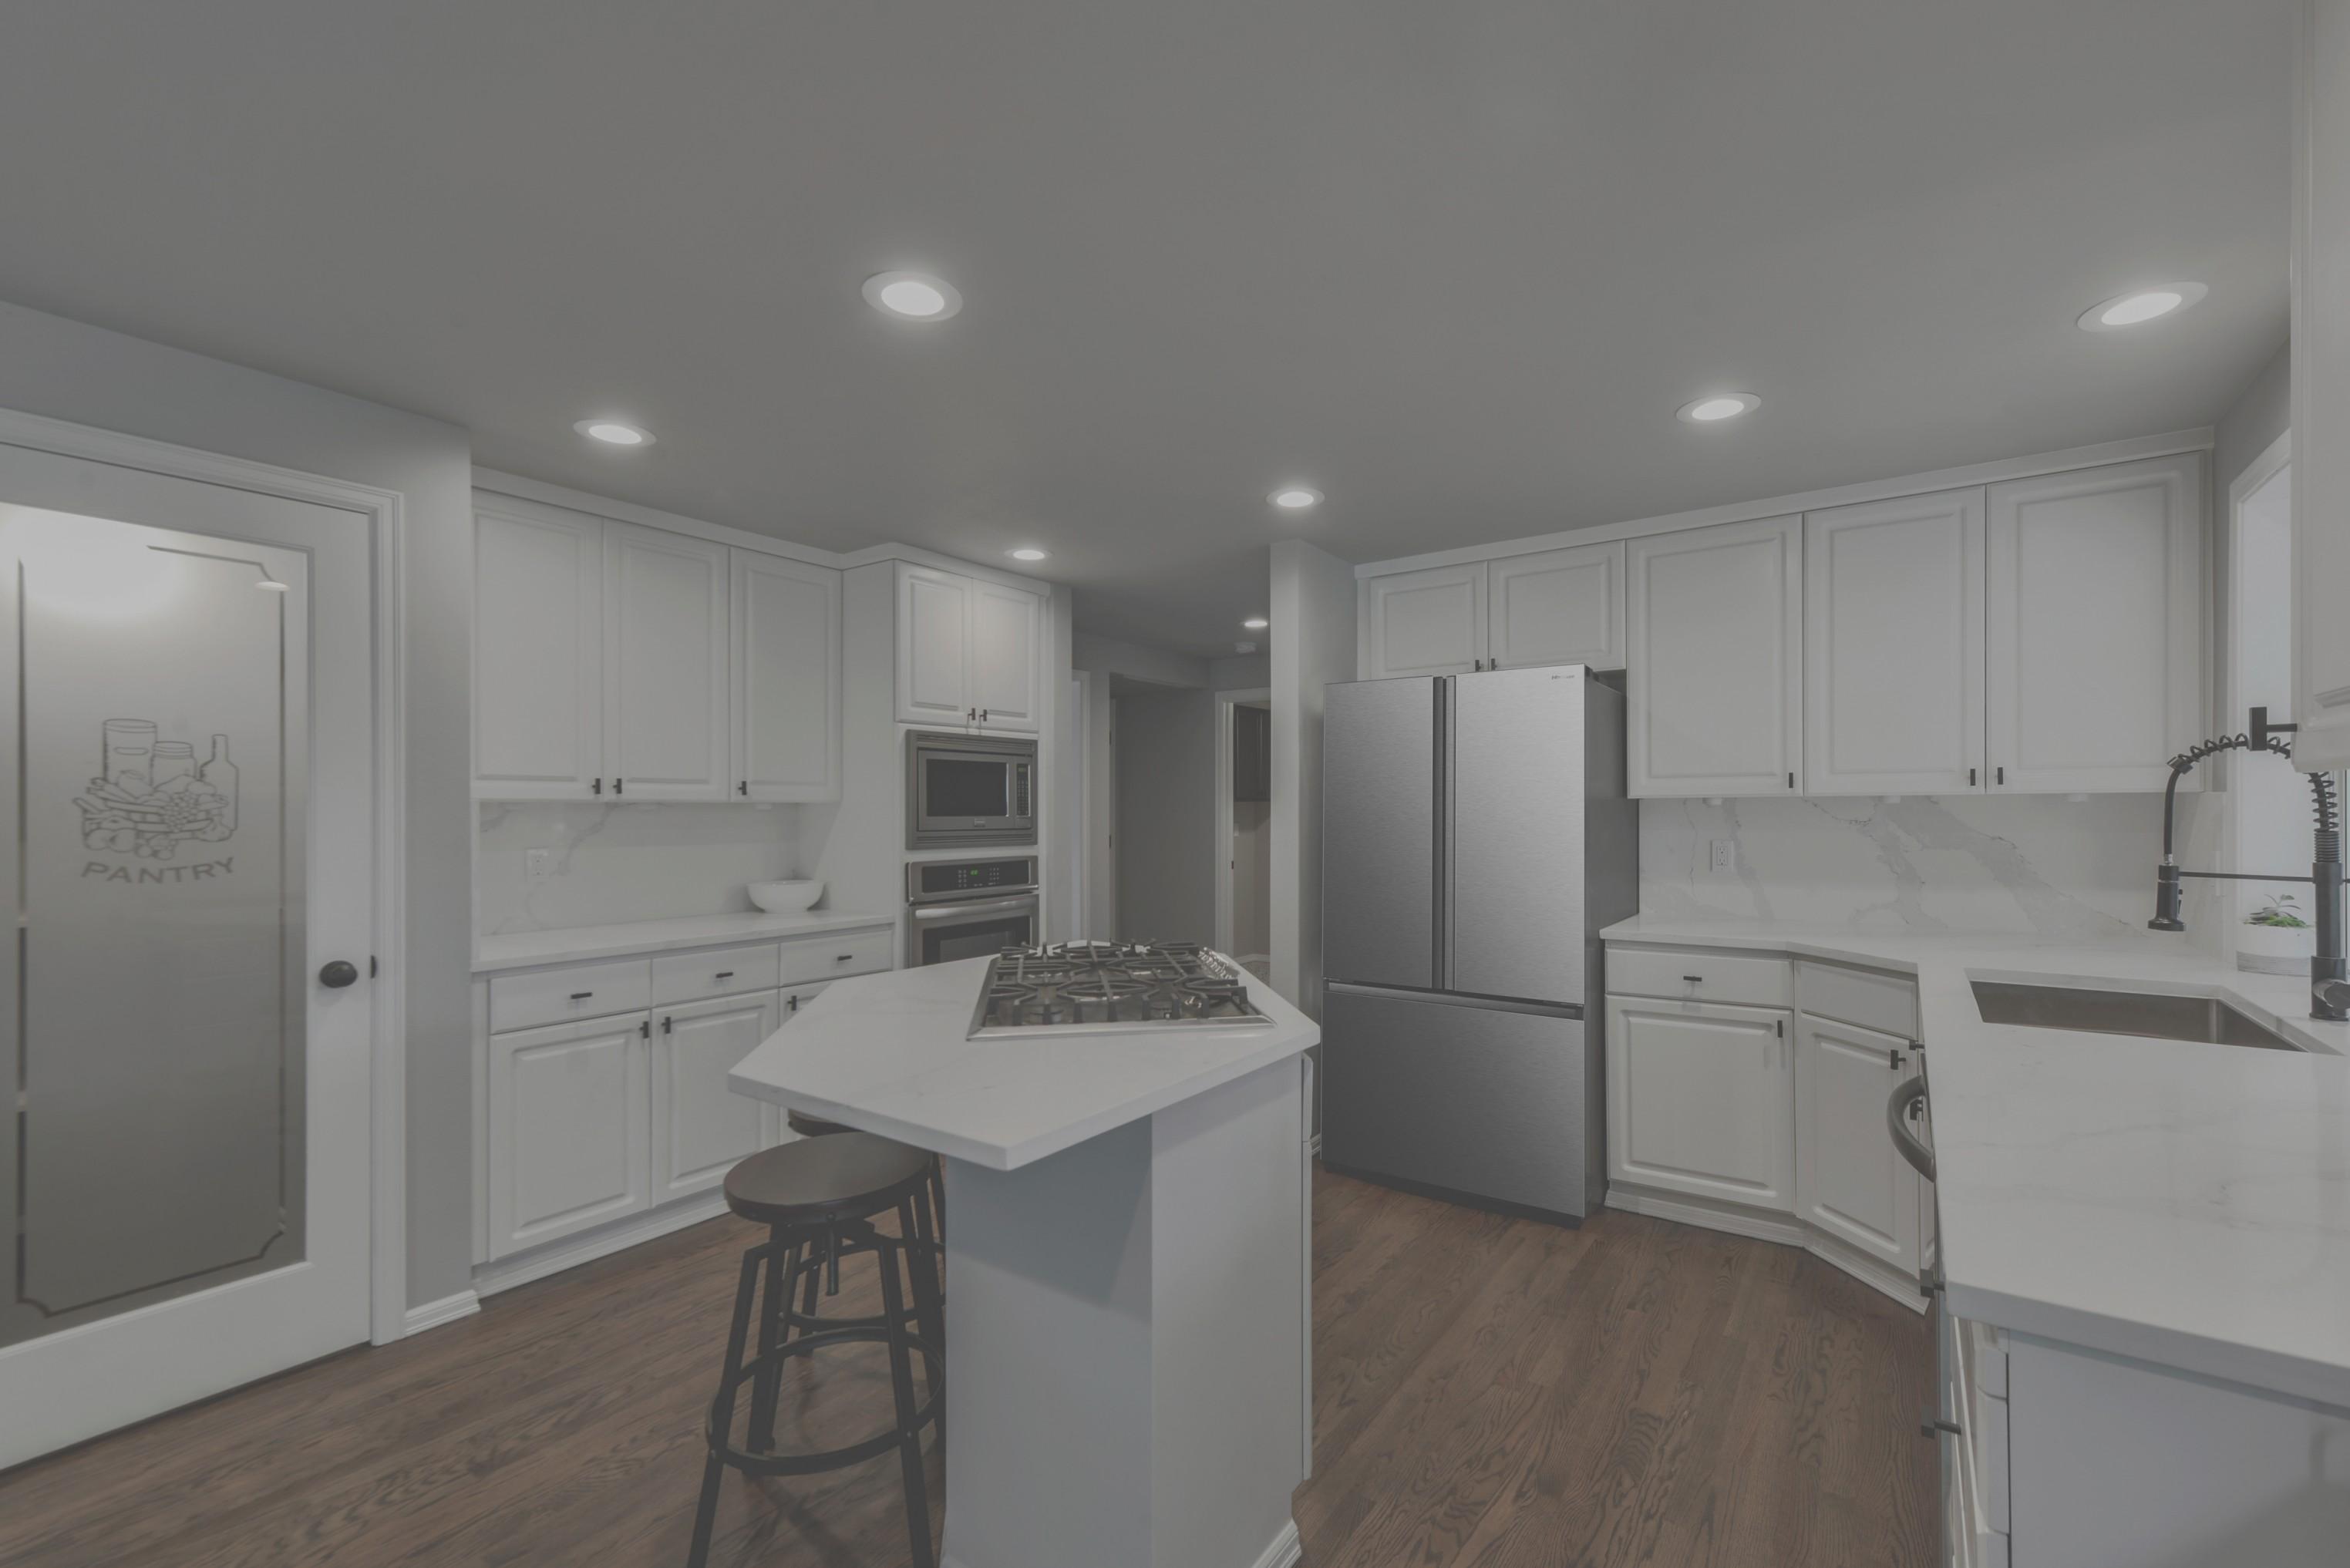 Hisense Refrigerators